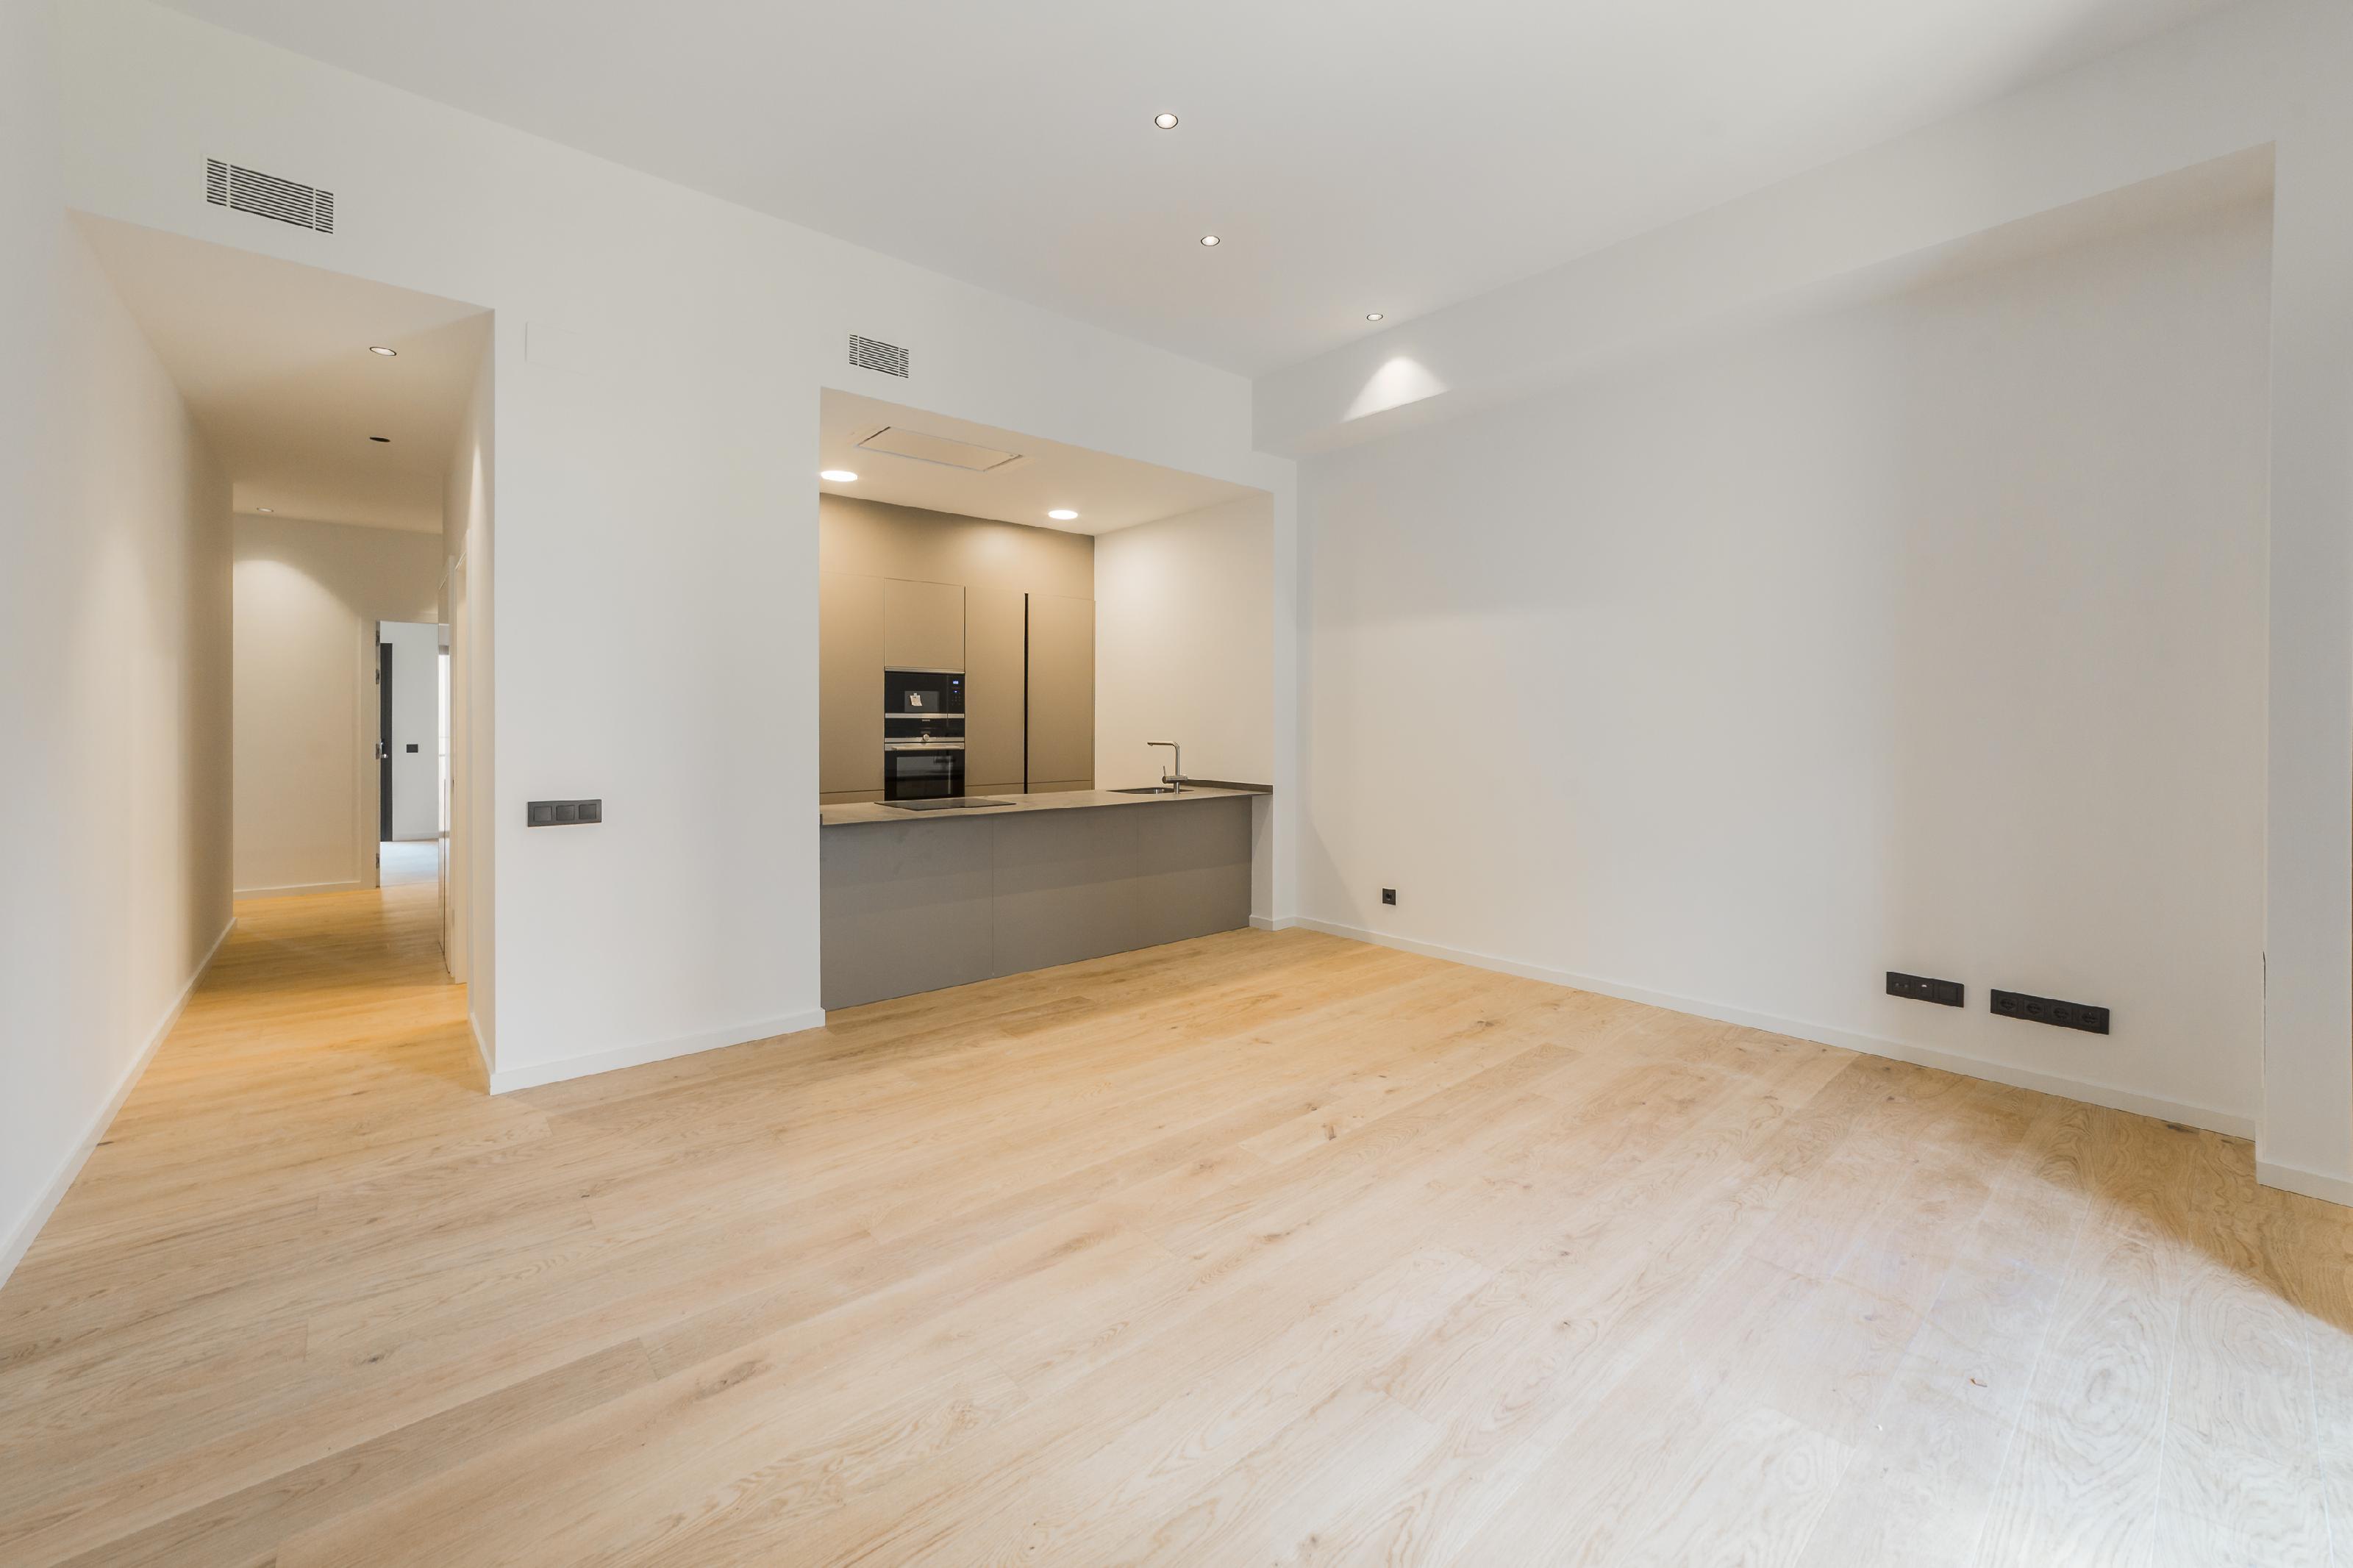 182456 Apartamento en venda en Eixample, Antiga Esquerre Eixample 11